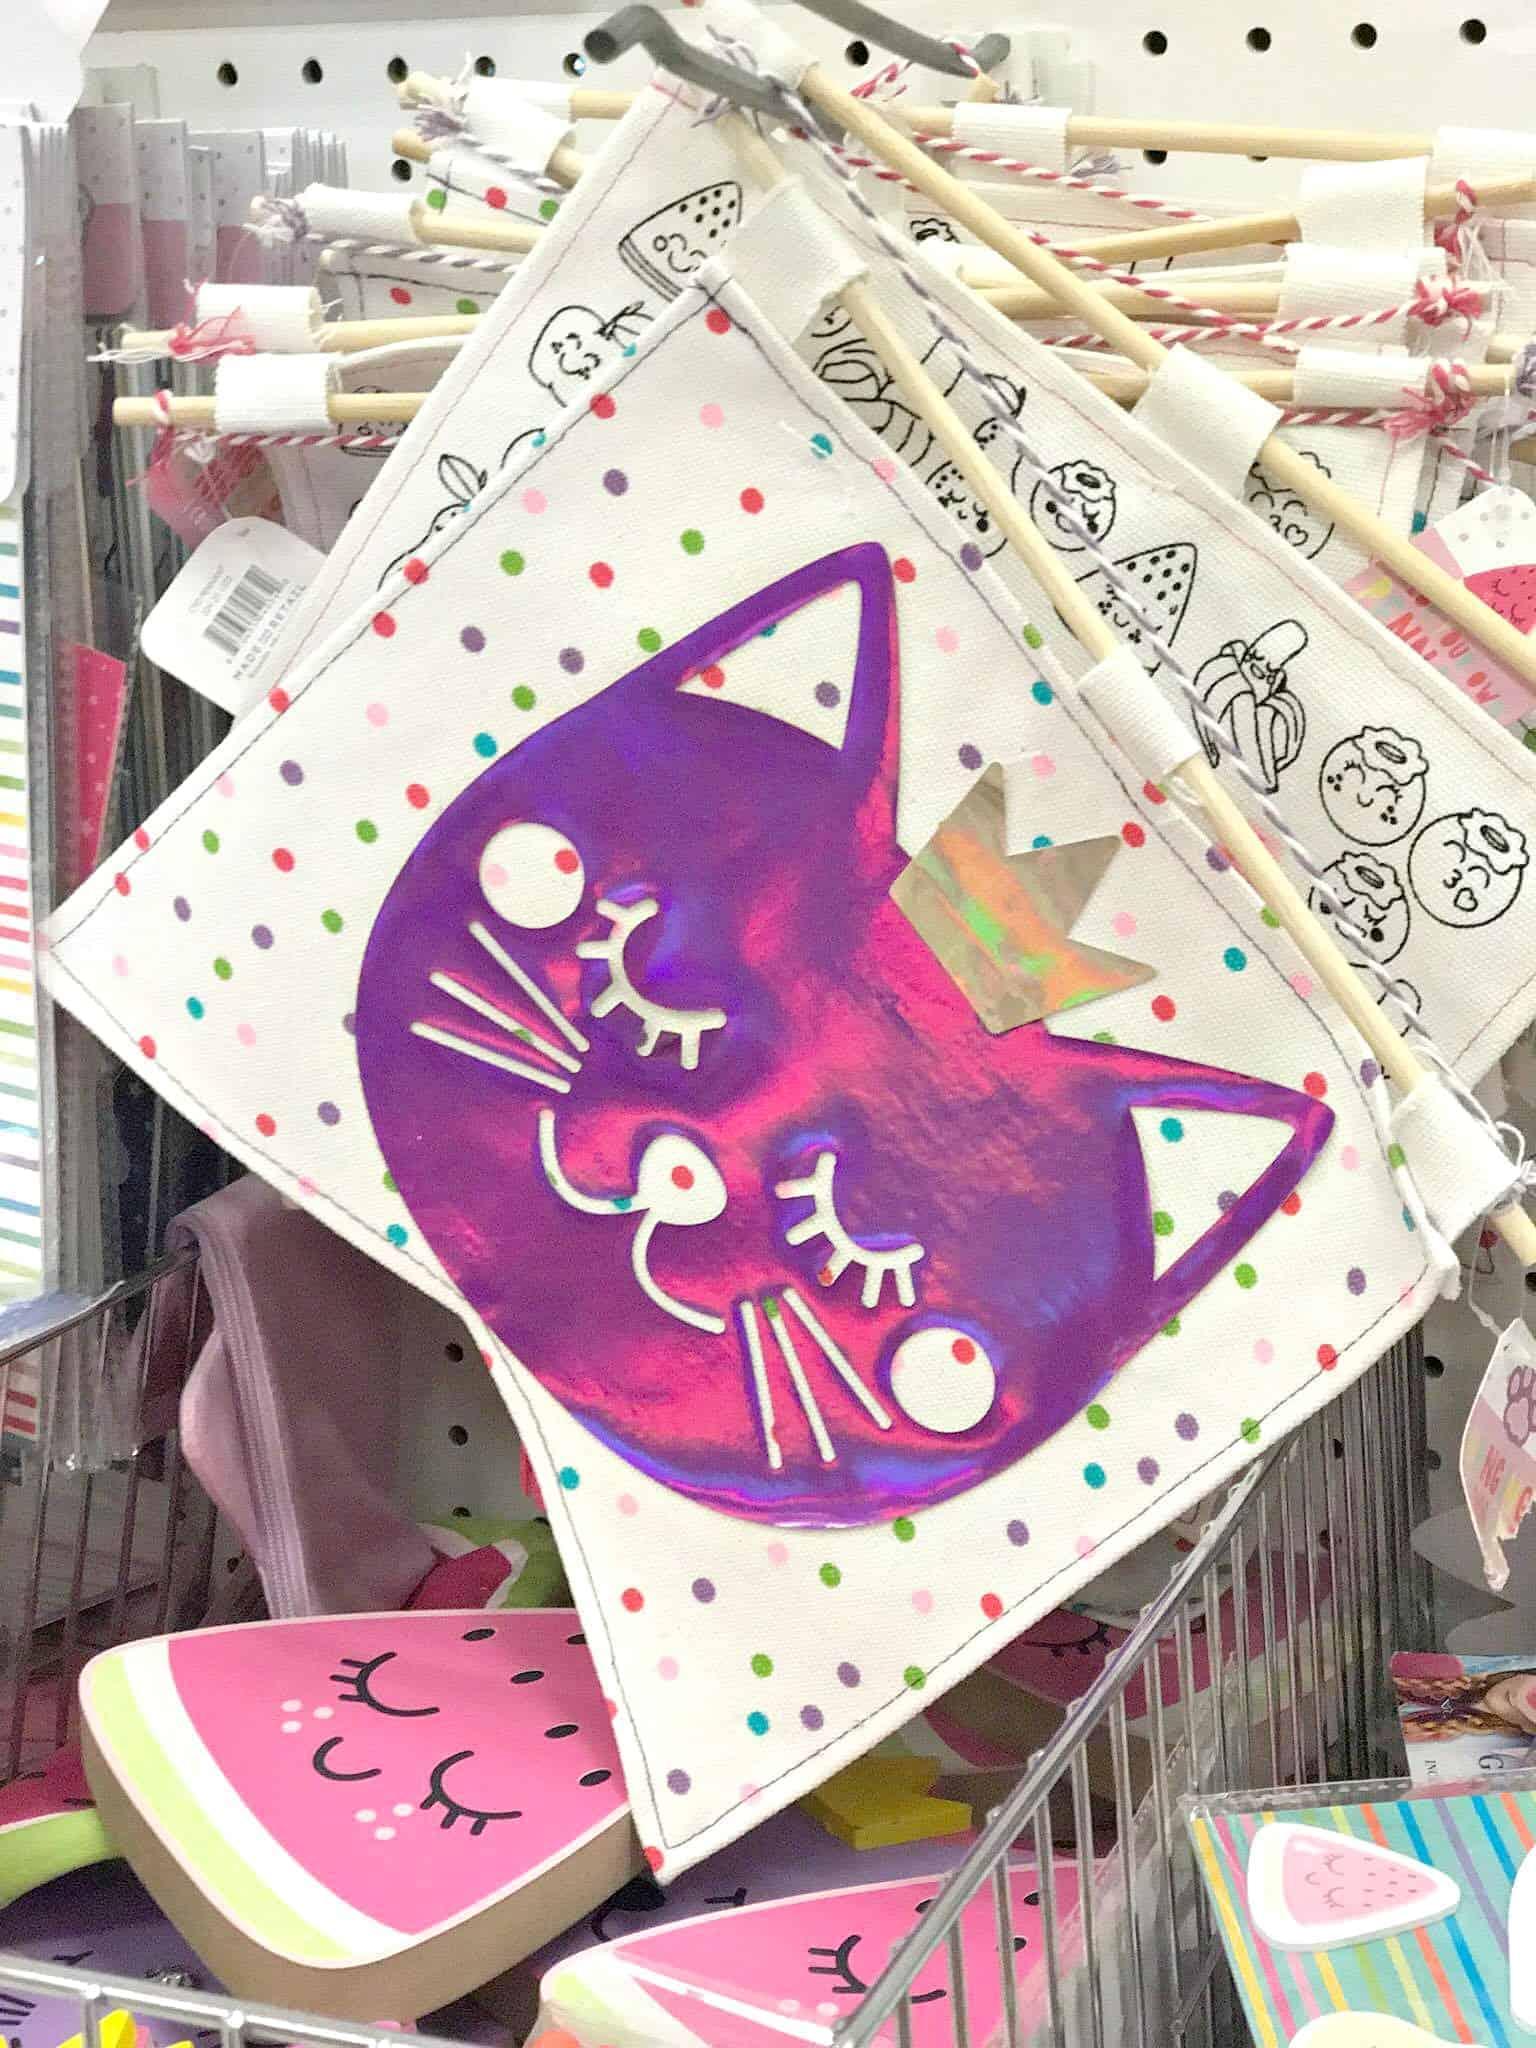 Target's Adorable Dollar Bin Stationary Picks